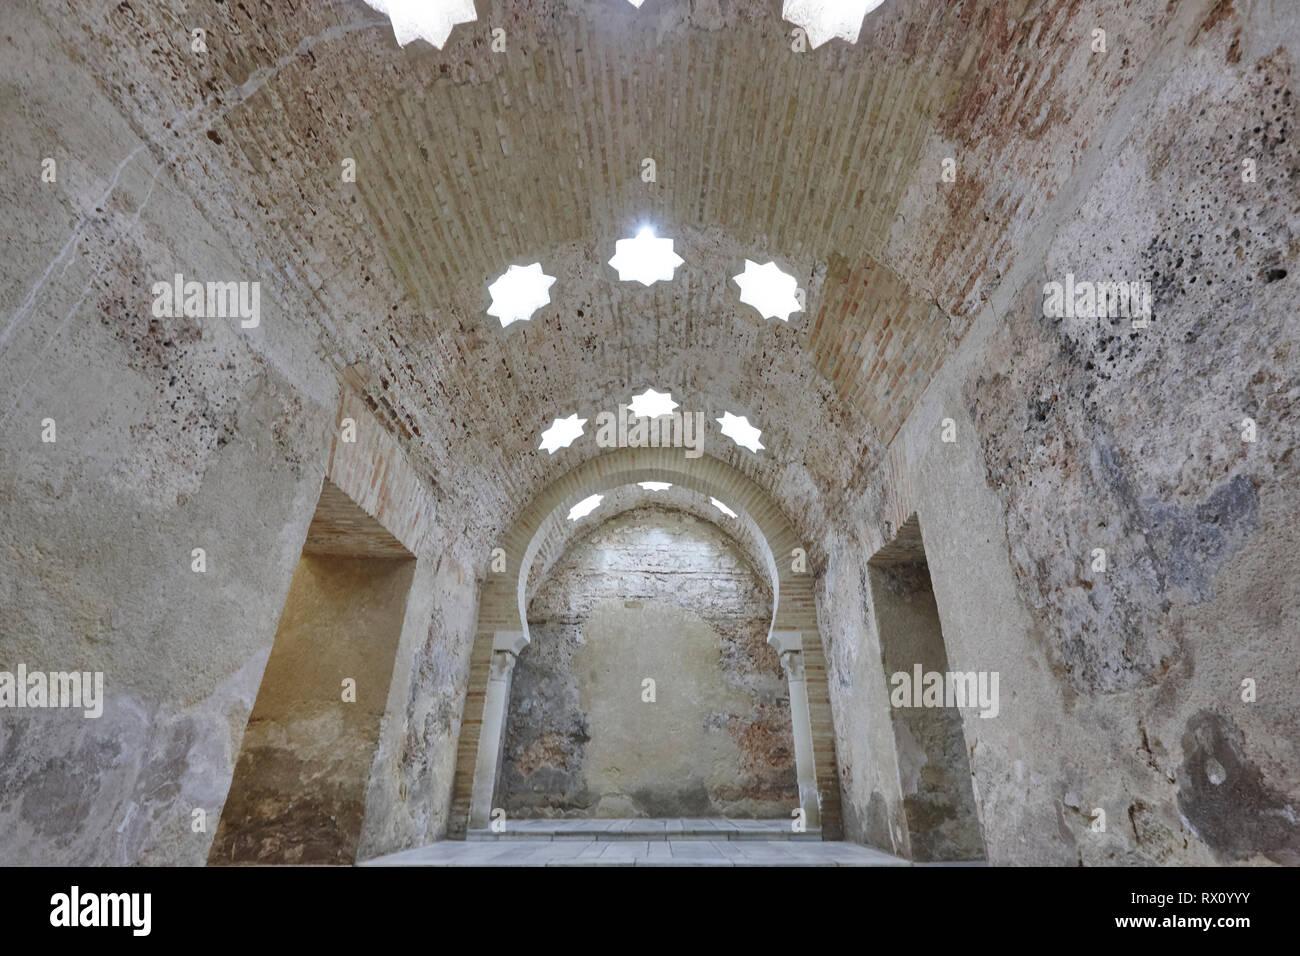 Arabian baths building interior in Jaen, Spain. XI century architecture. - Stock Image